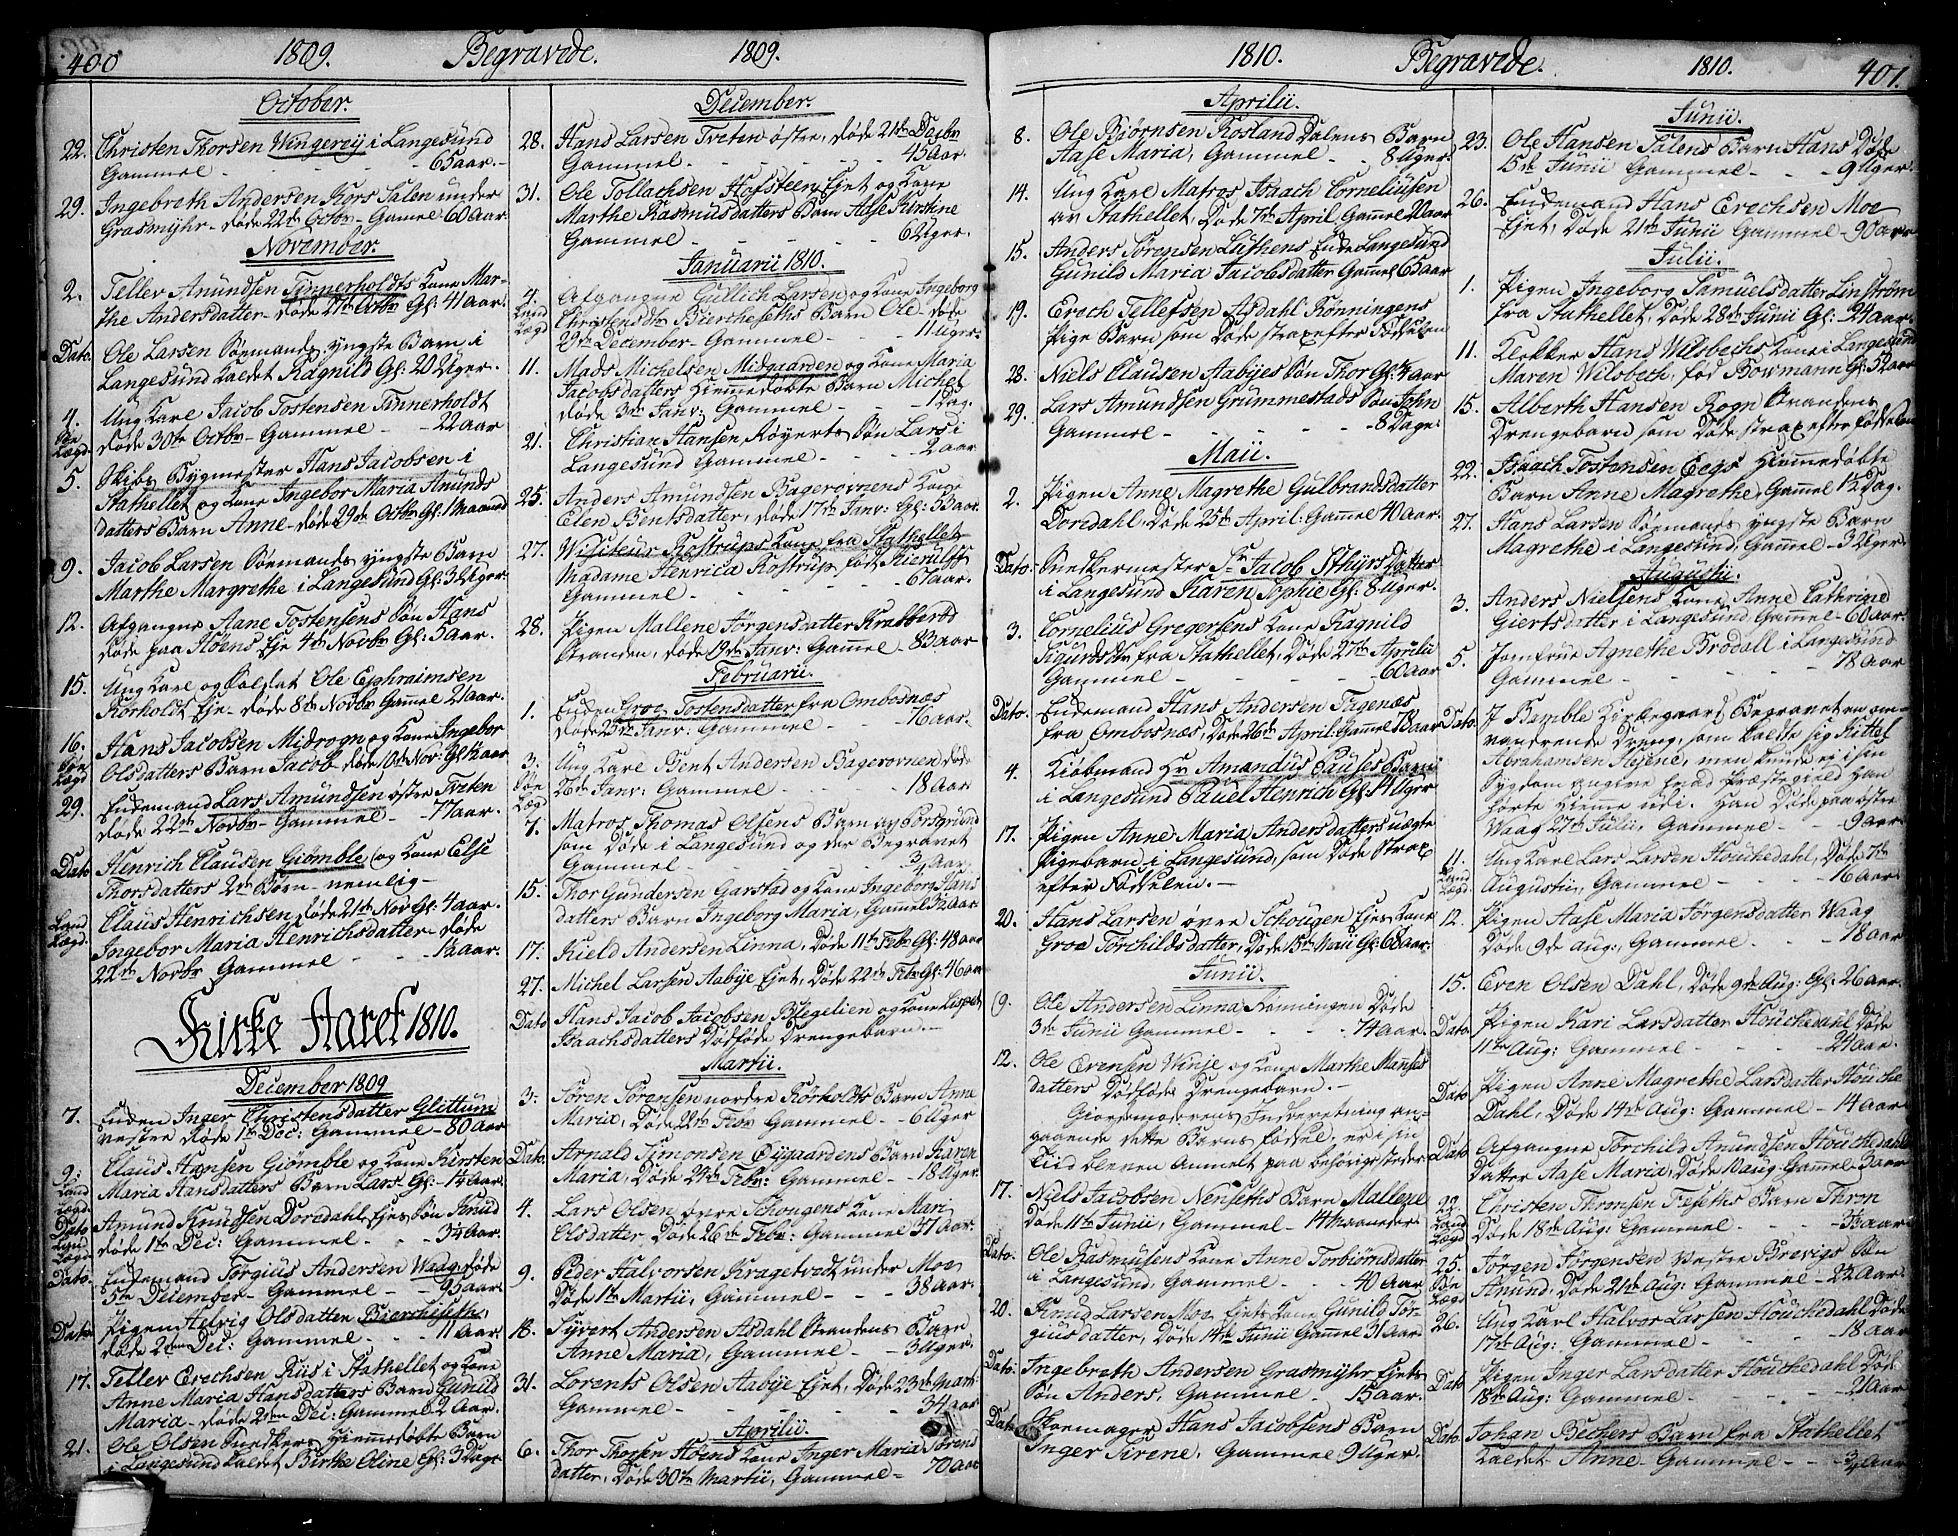 SAKO, Bamble kirkebøker, F/Fa/L0002: Ministerialbok nr. I 2, 1775-1814, s. 400-401